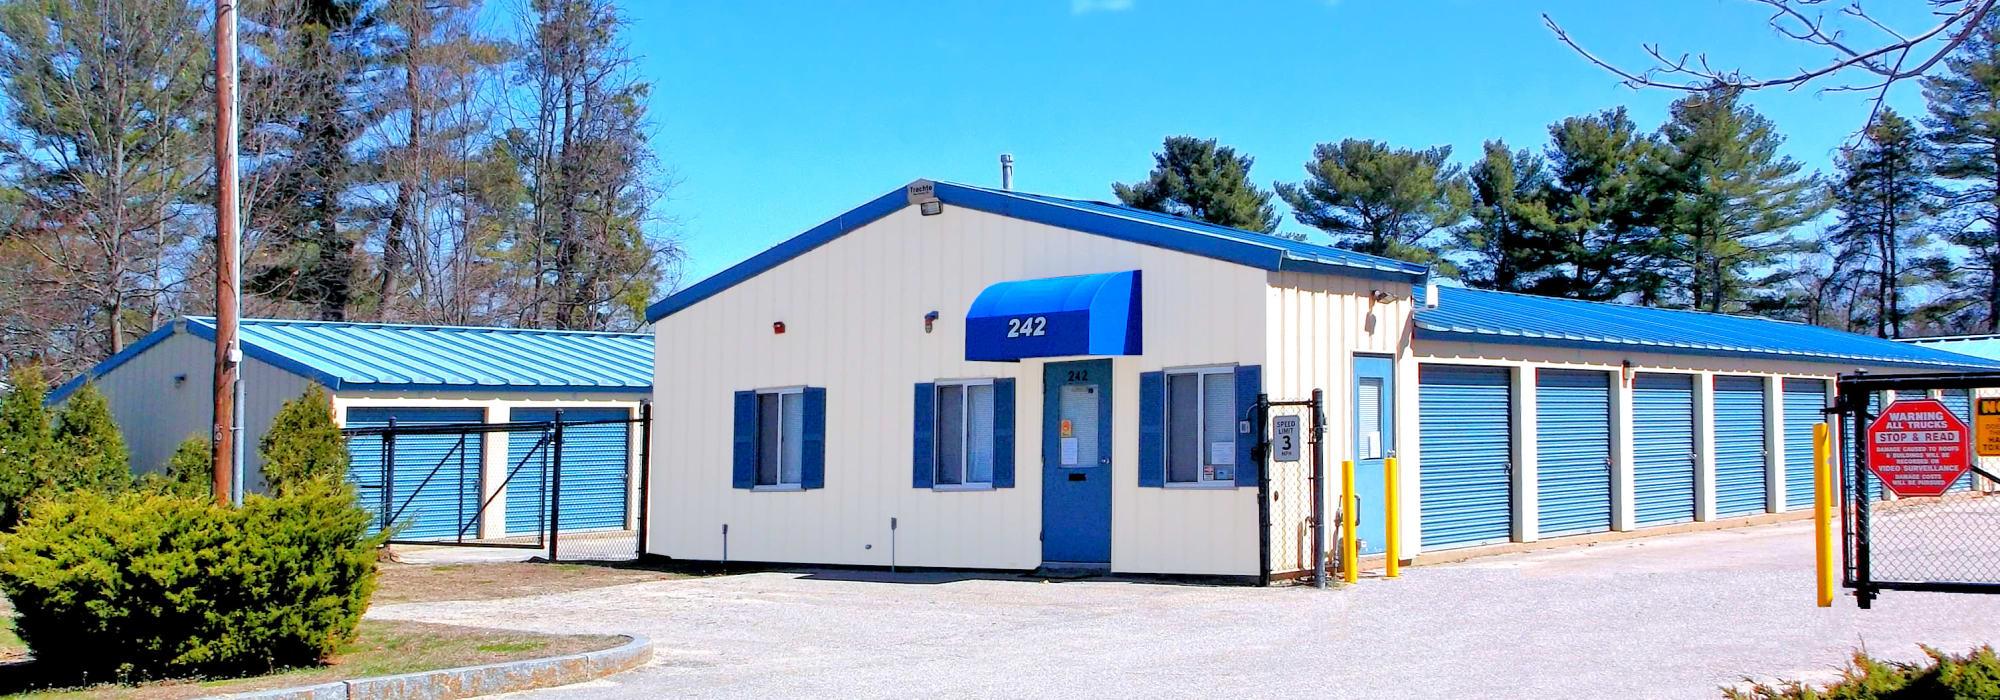 Prime Storage in Salisbury, MA